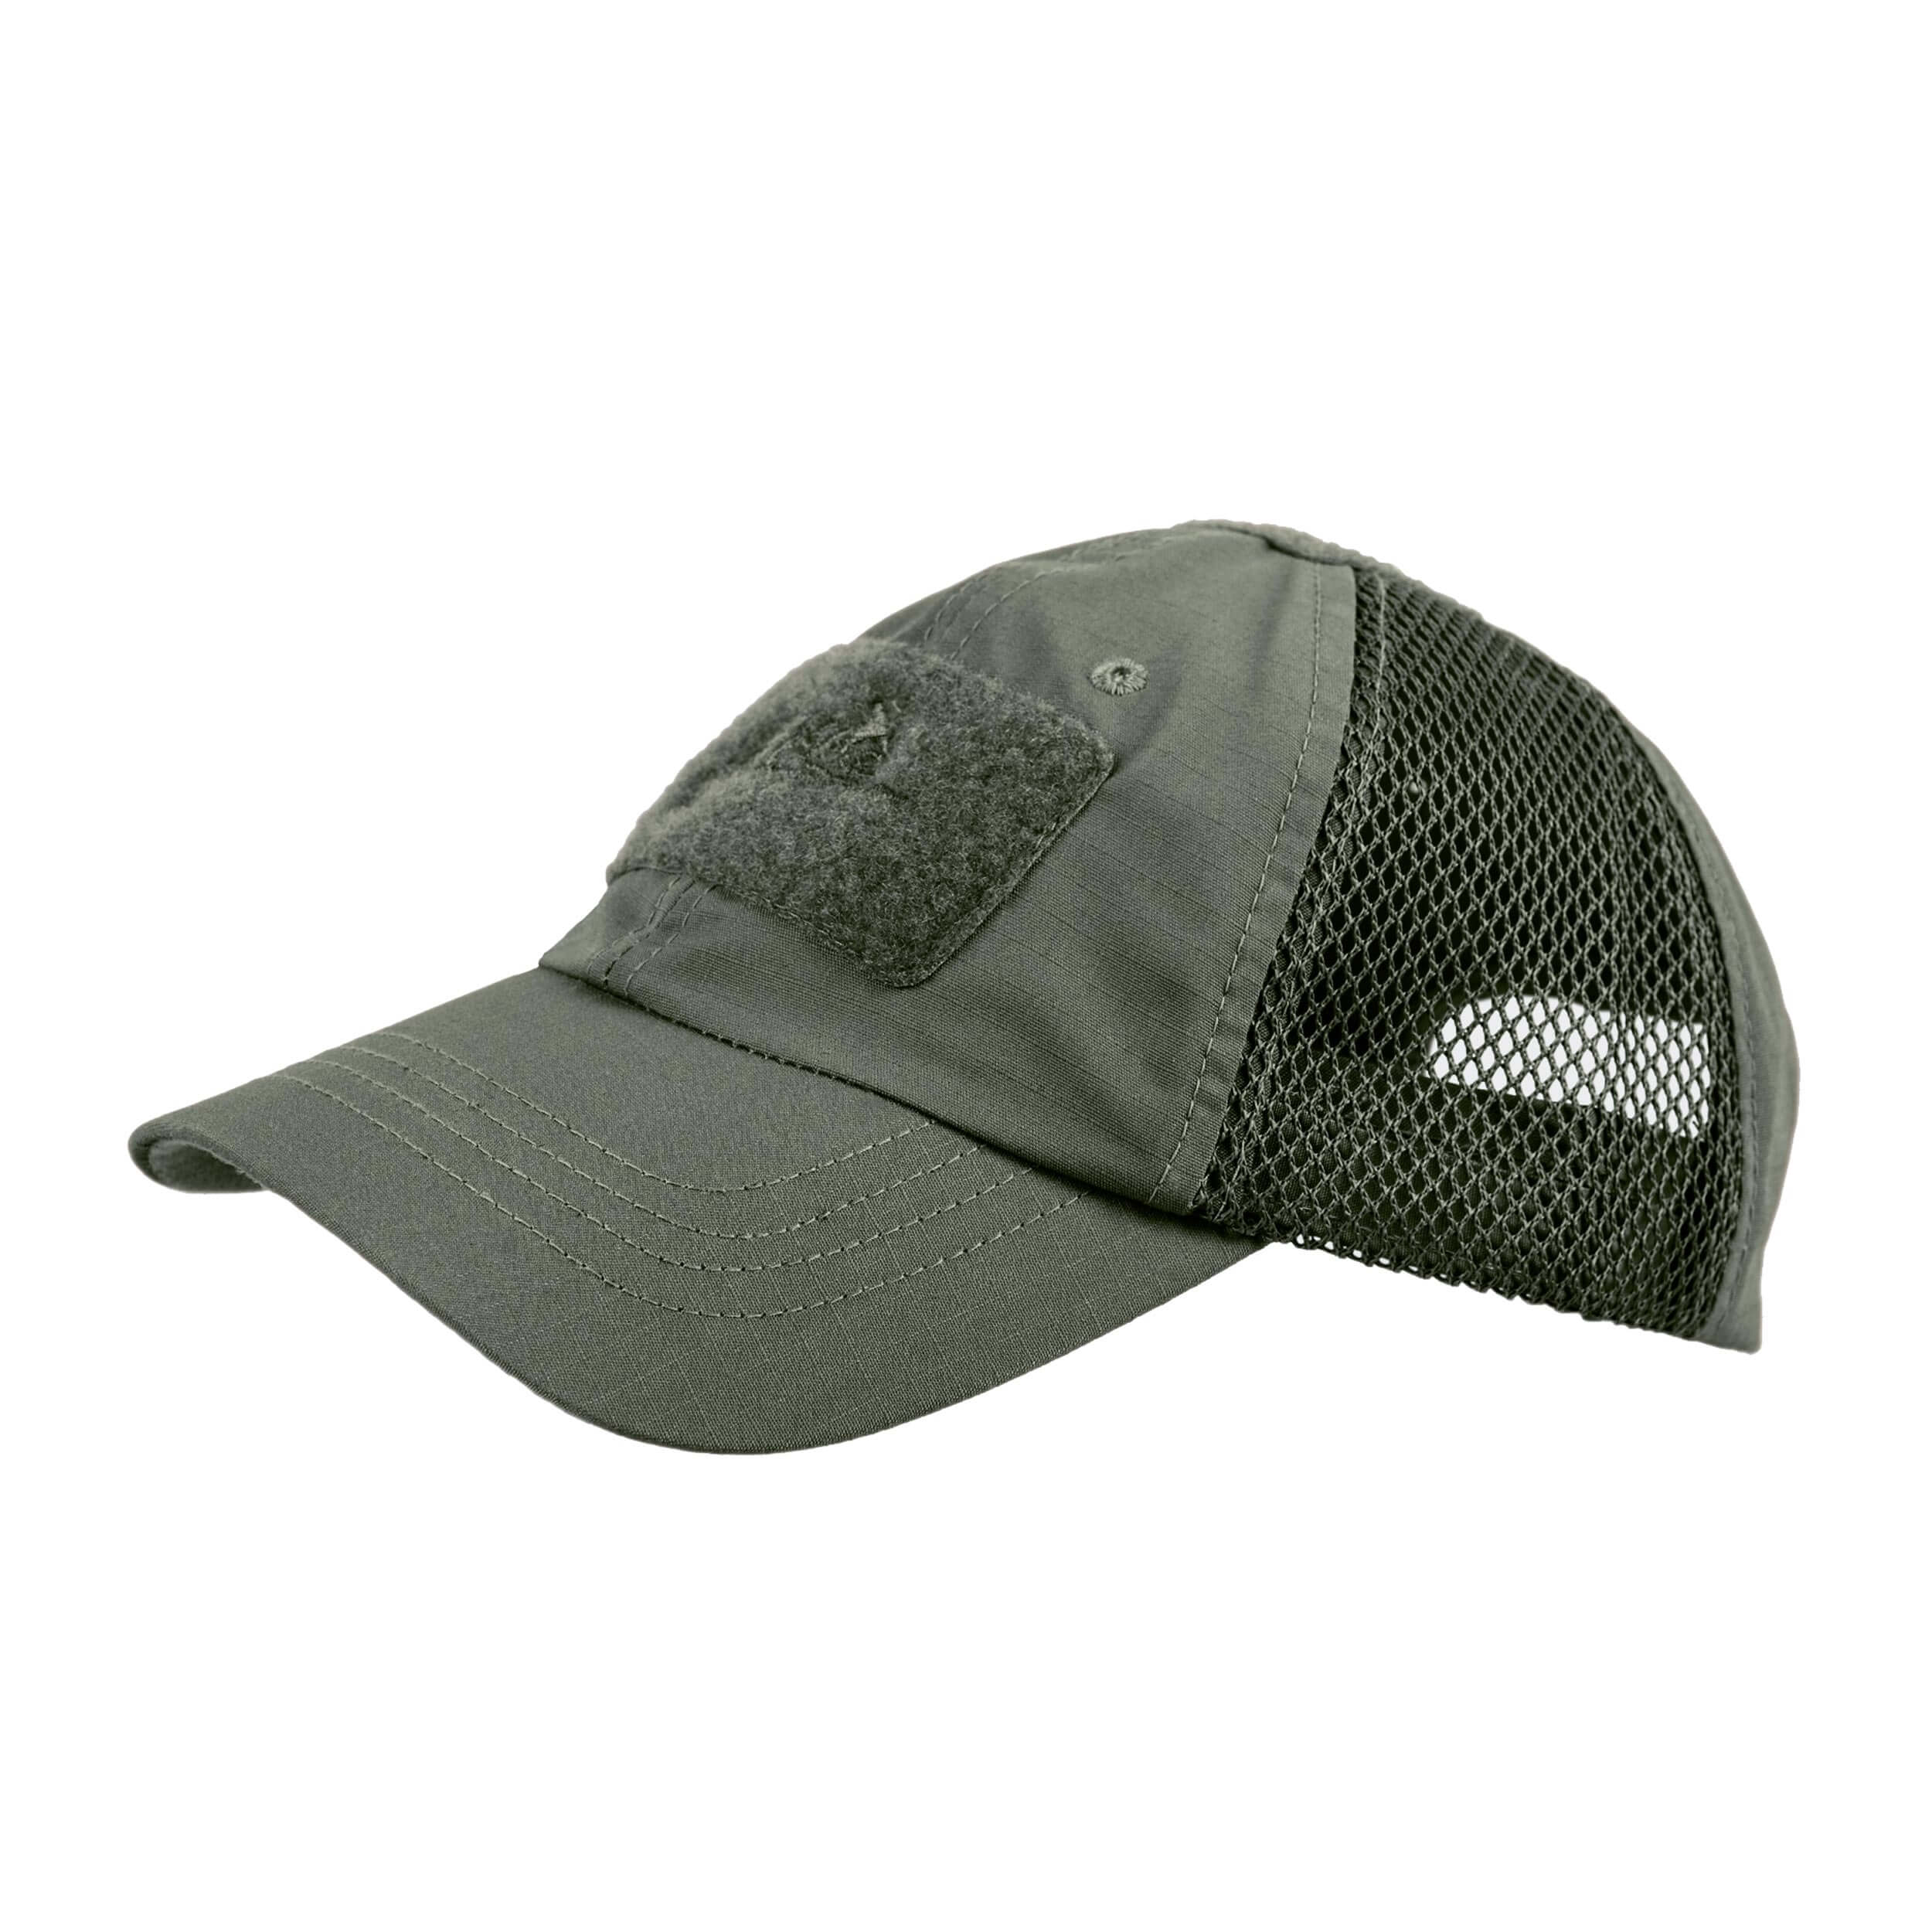 Helikon-Tex Baseball Vent Cap - PolyCotton Ripstop - Olive Drab